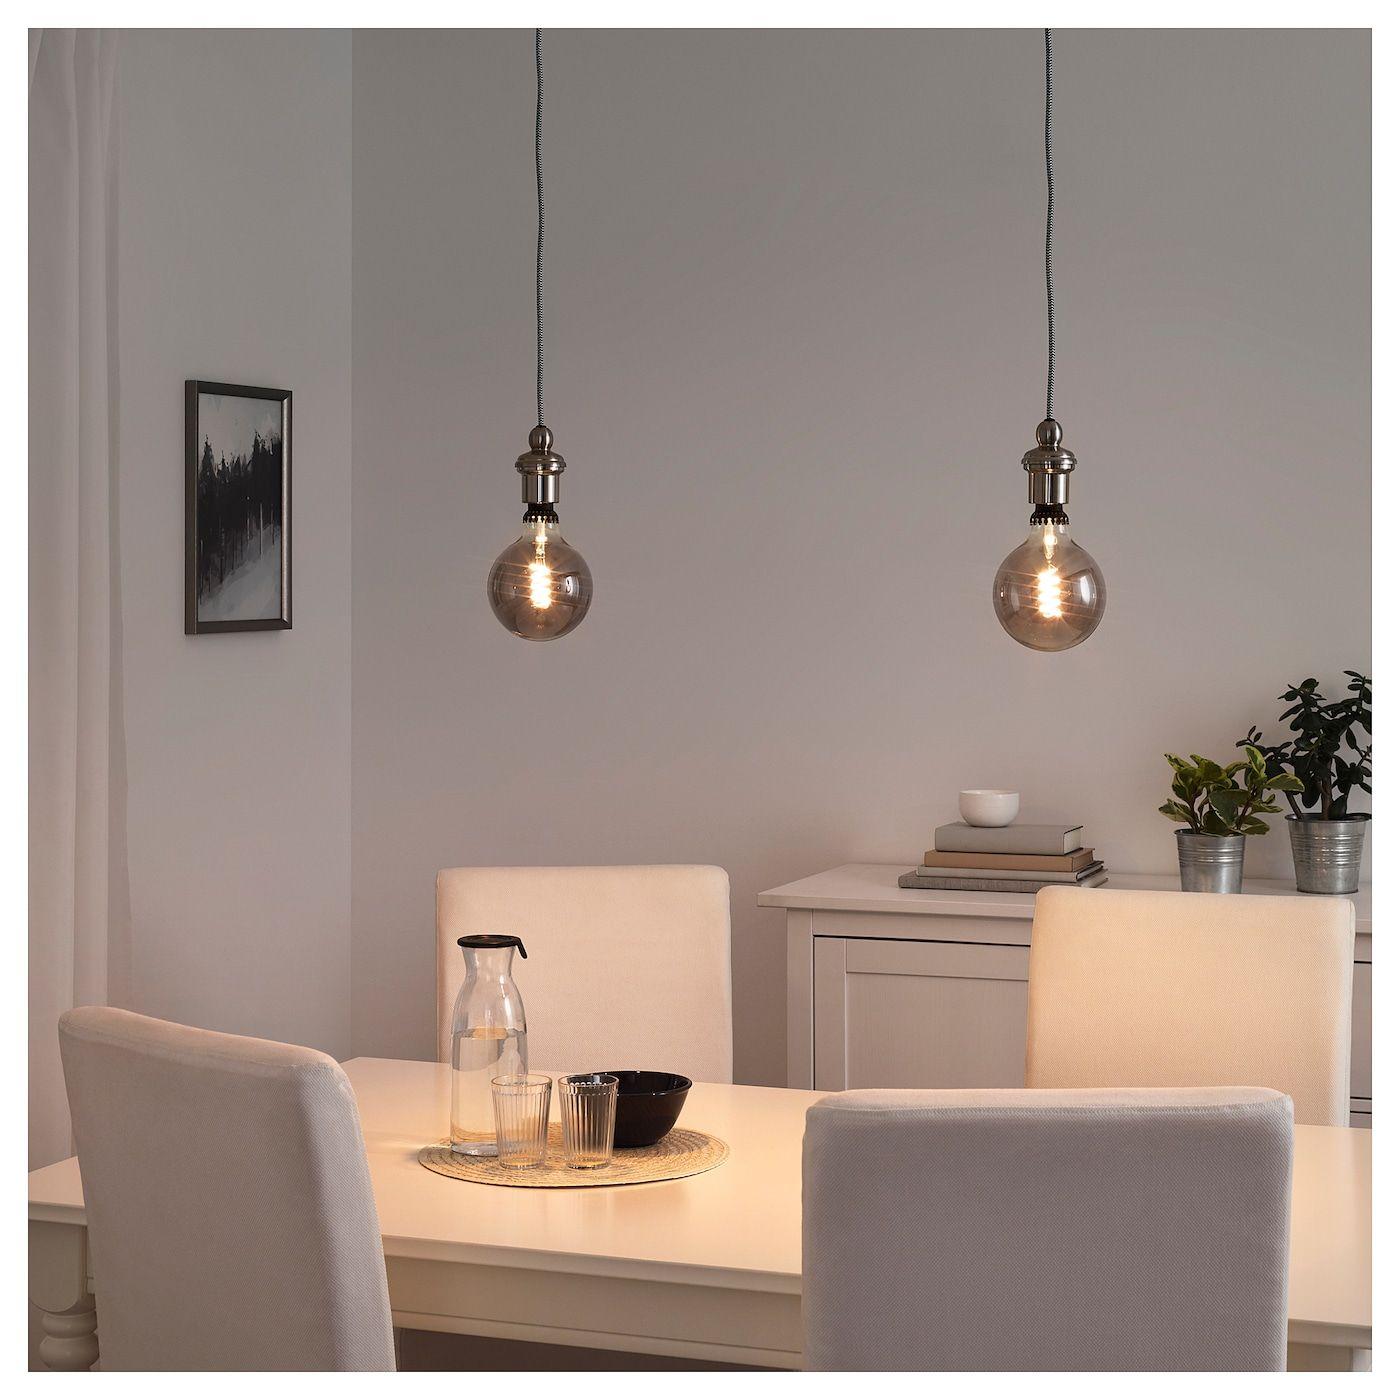 Rollsbo Led Leuchtmittel E27 200 Lm Dimmbar Rund Klarglas Grau 125 Mm Ikea Österreich Hängande Lampa Glödlampa Lampor